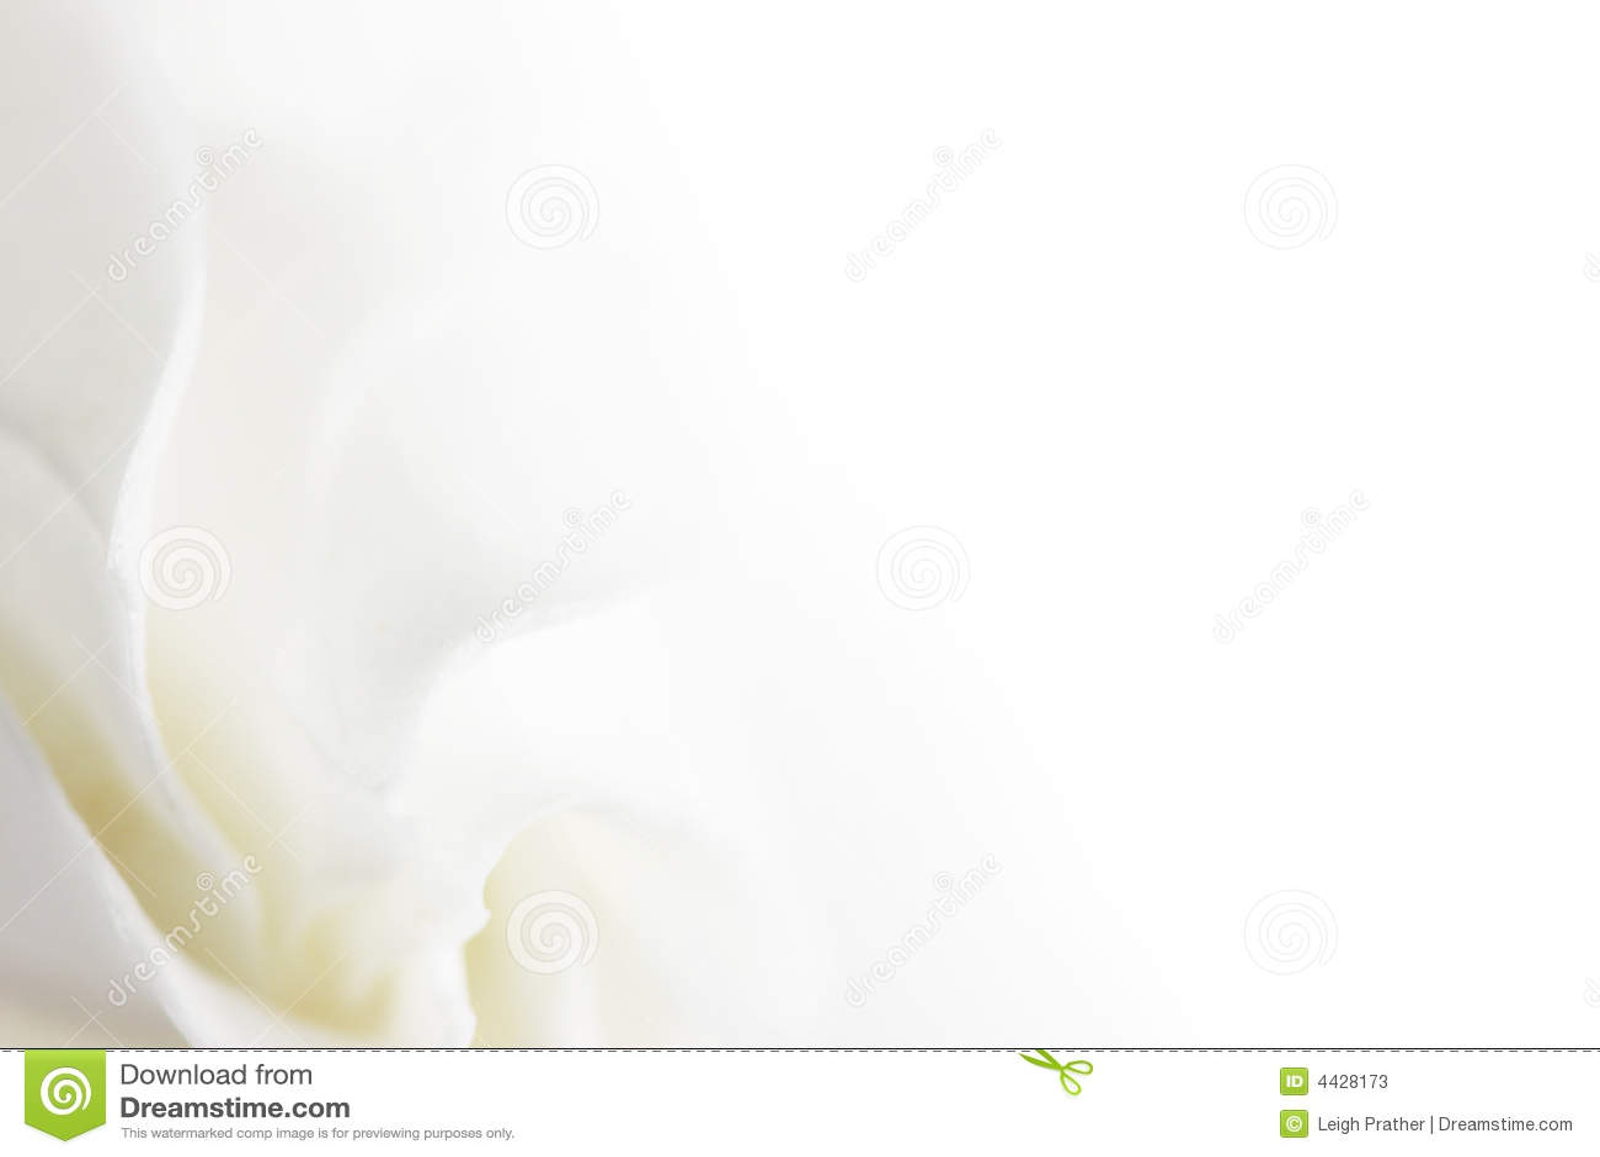 Soft White Flower Background Stock Image Image Of Relaxation